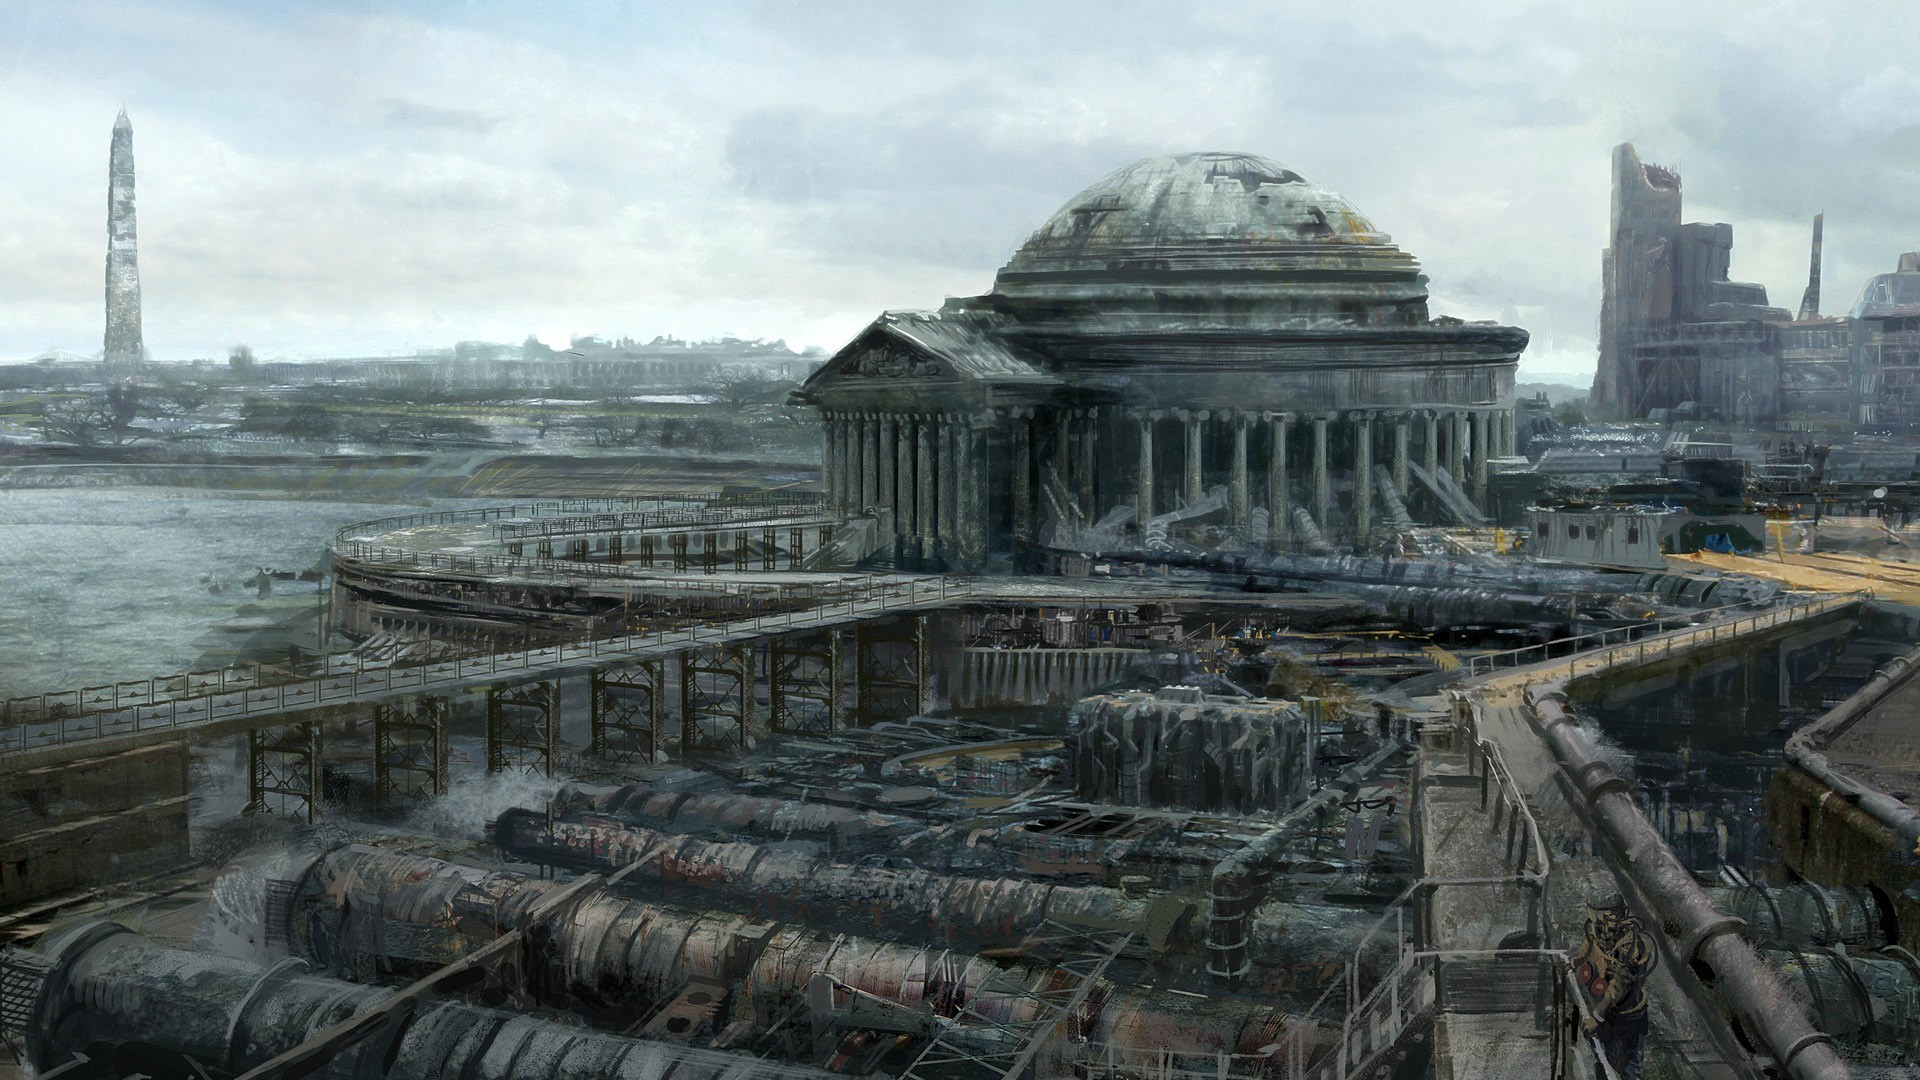 Fallout-3-concept-art-of-the-Jefferson-memorial-